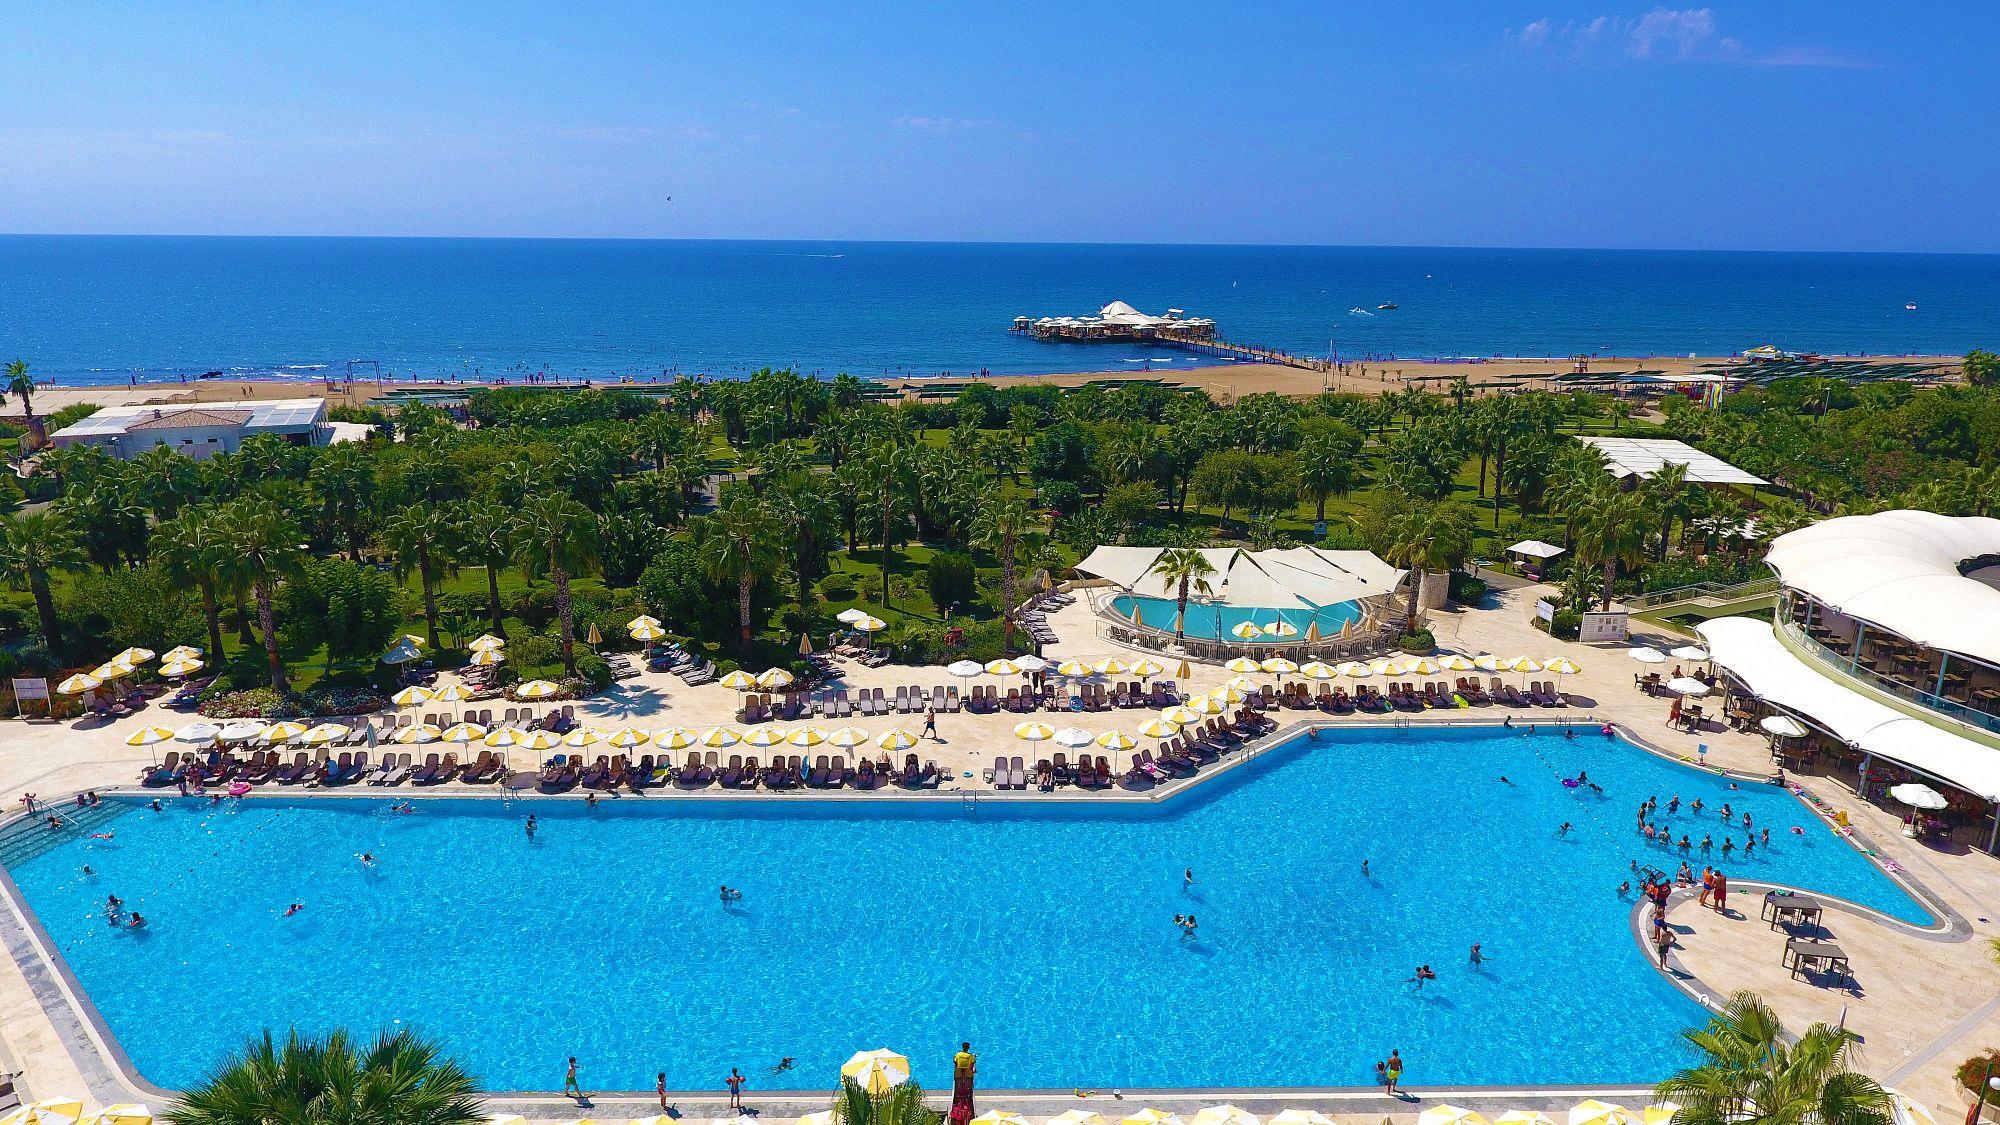 http://www.orextravel.sk/OREX/hotelphotos/vonresort-golden-coast-general-0040.jpg